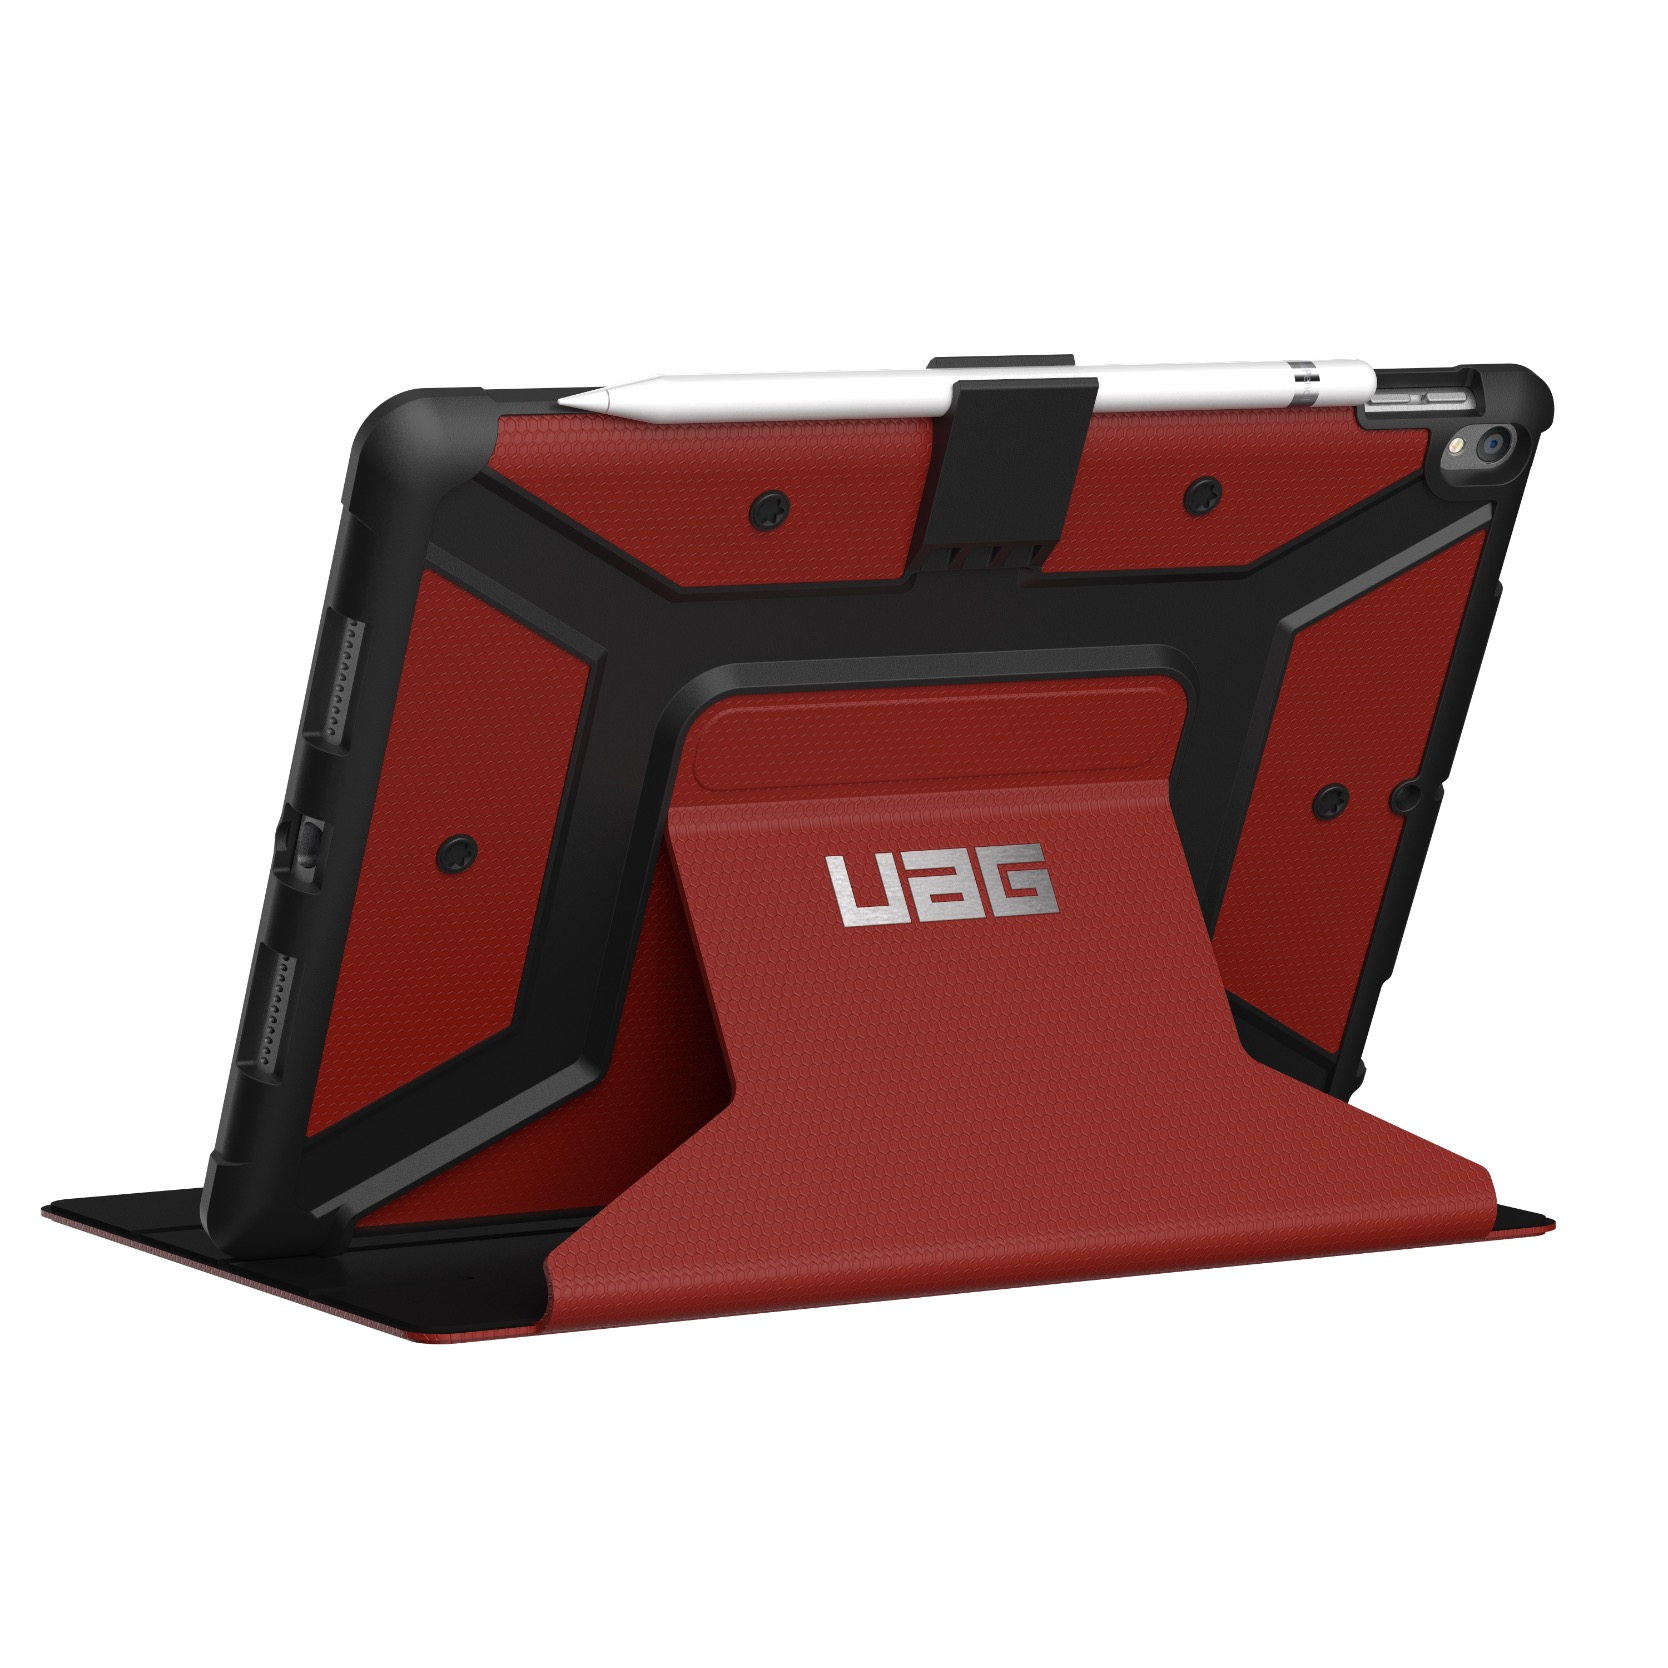 iPad PRO 10.5 pouces Etui Folio Armure Metropolys Cover ecran Rouge magma